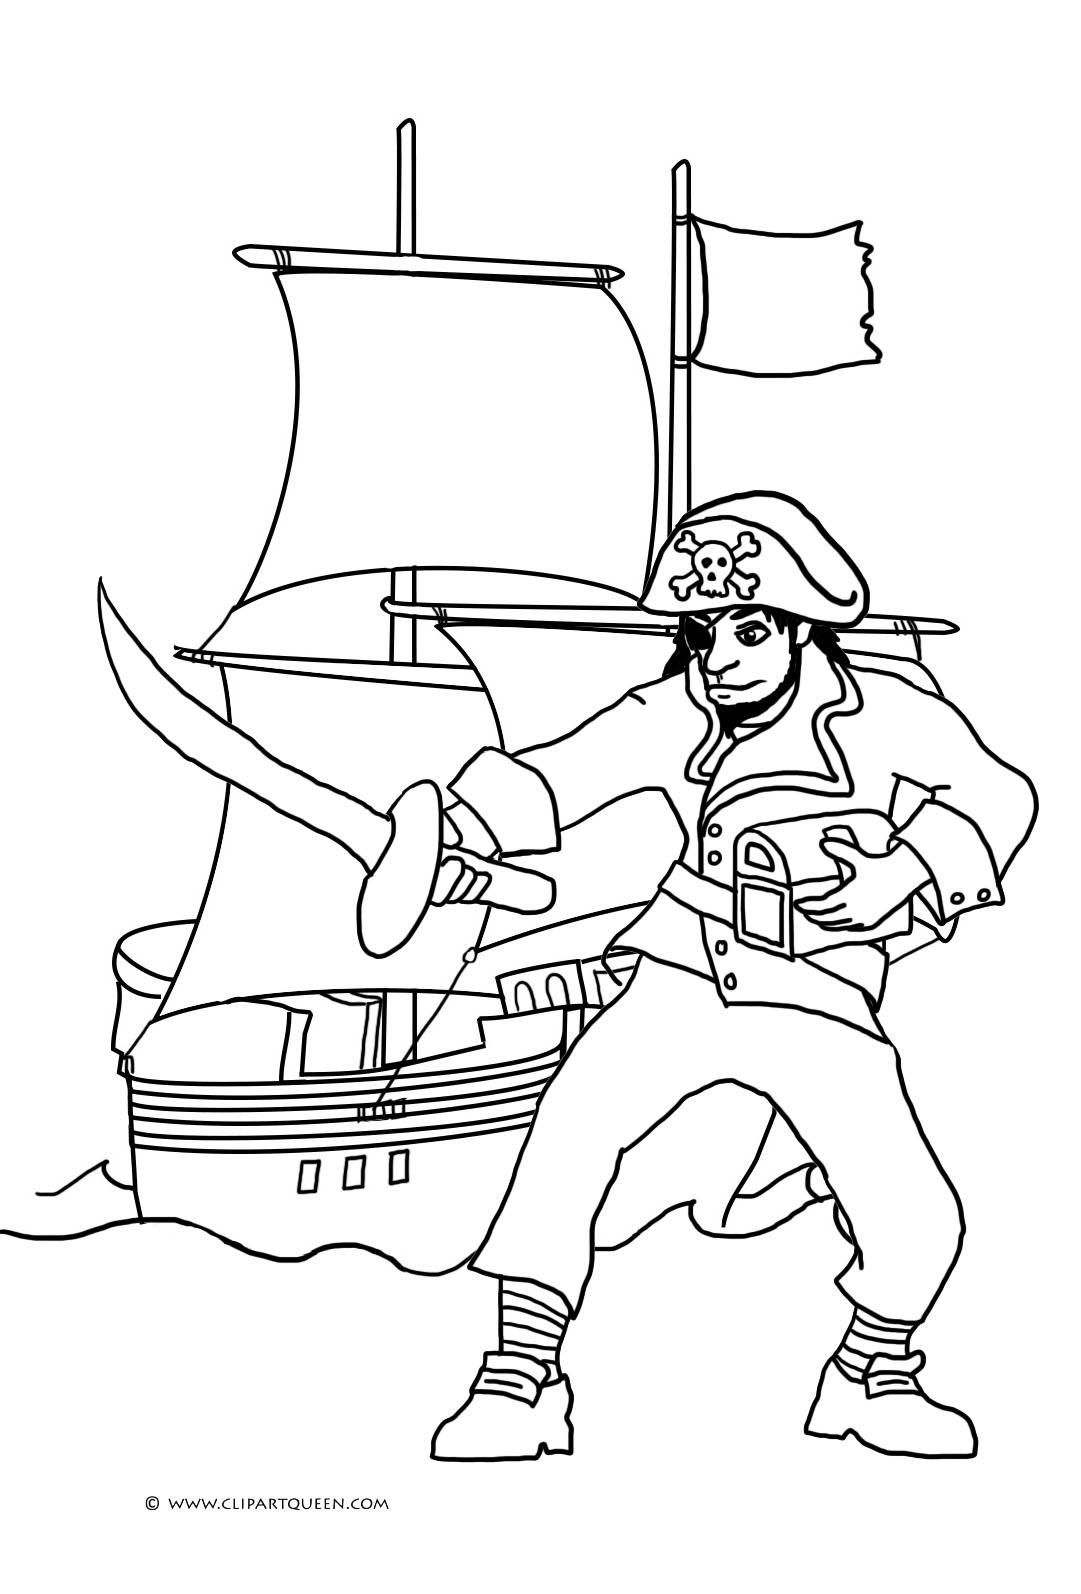 Simple Pirate Ship Drawing at GetDrawings | Free download